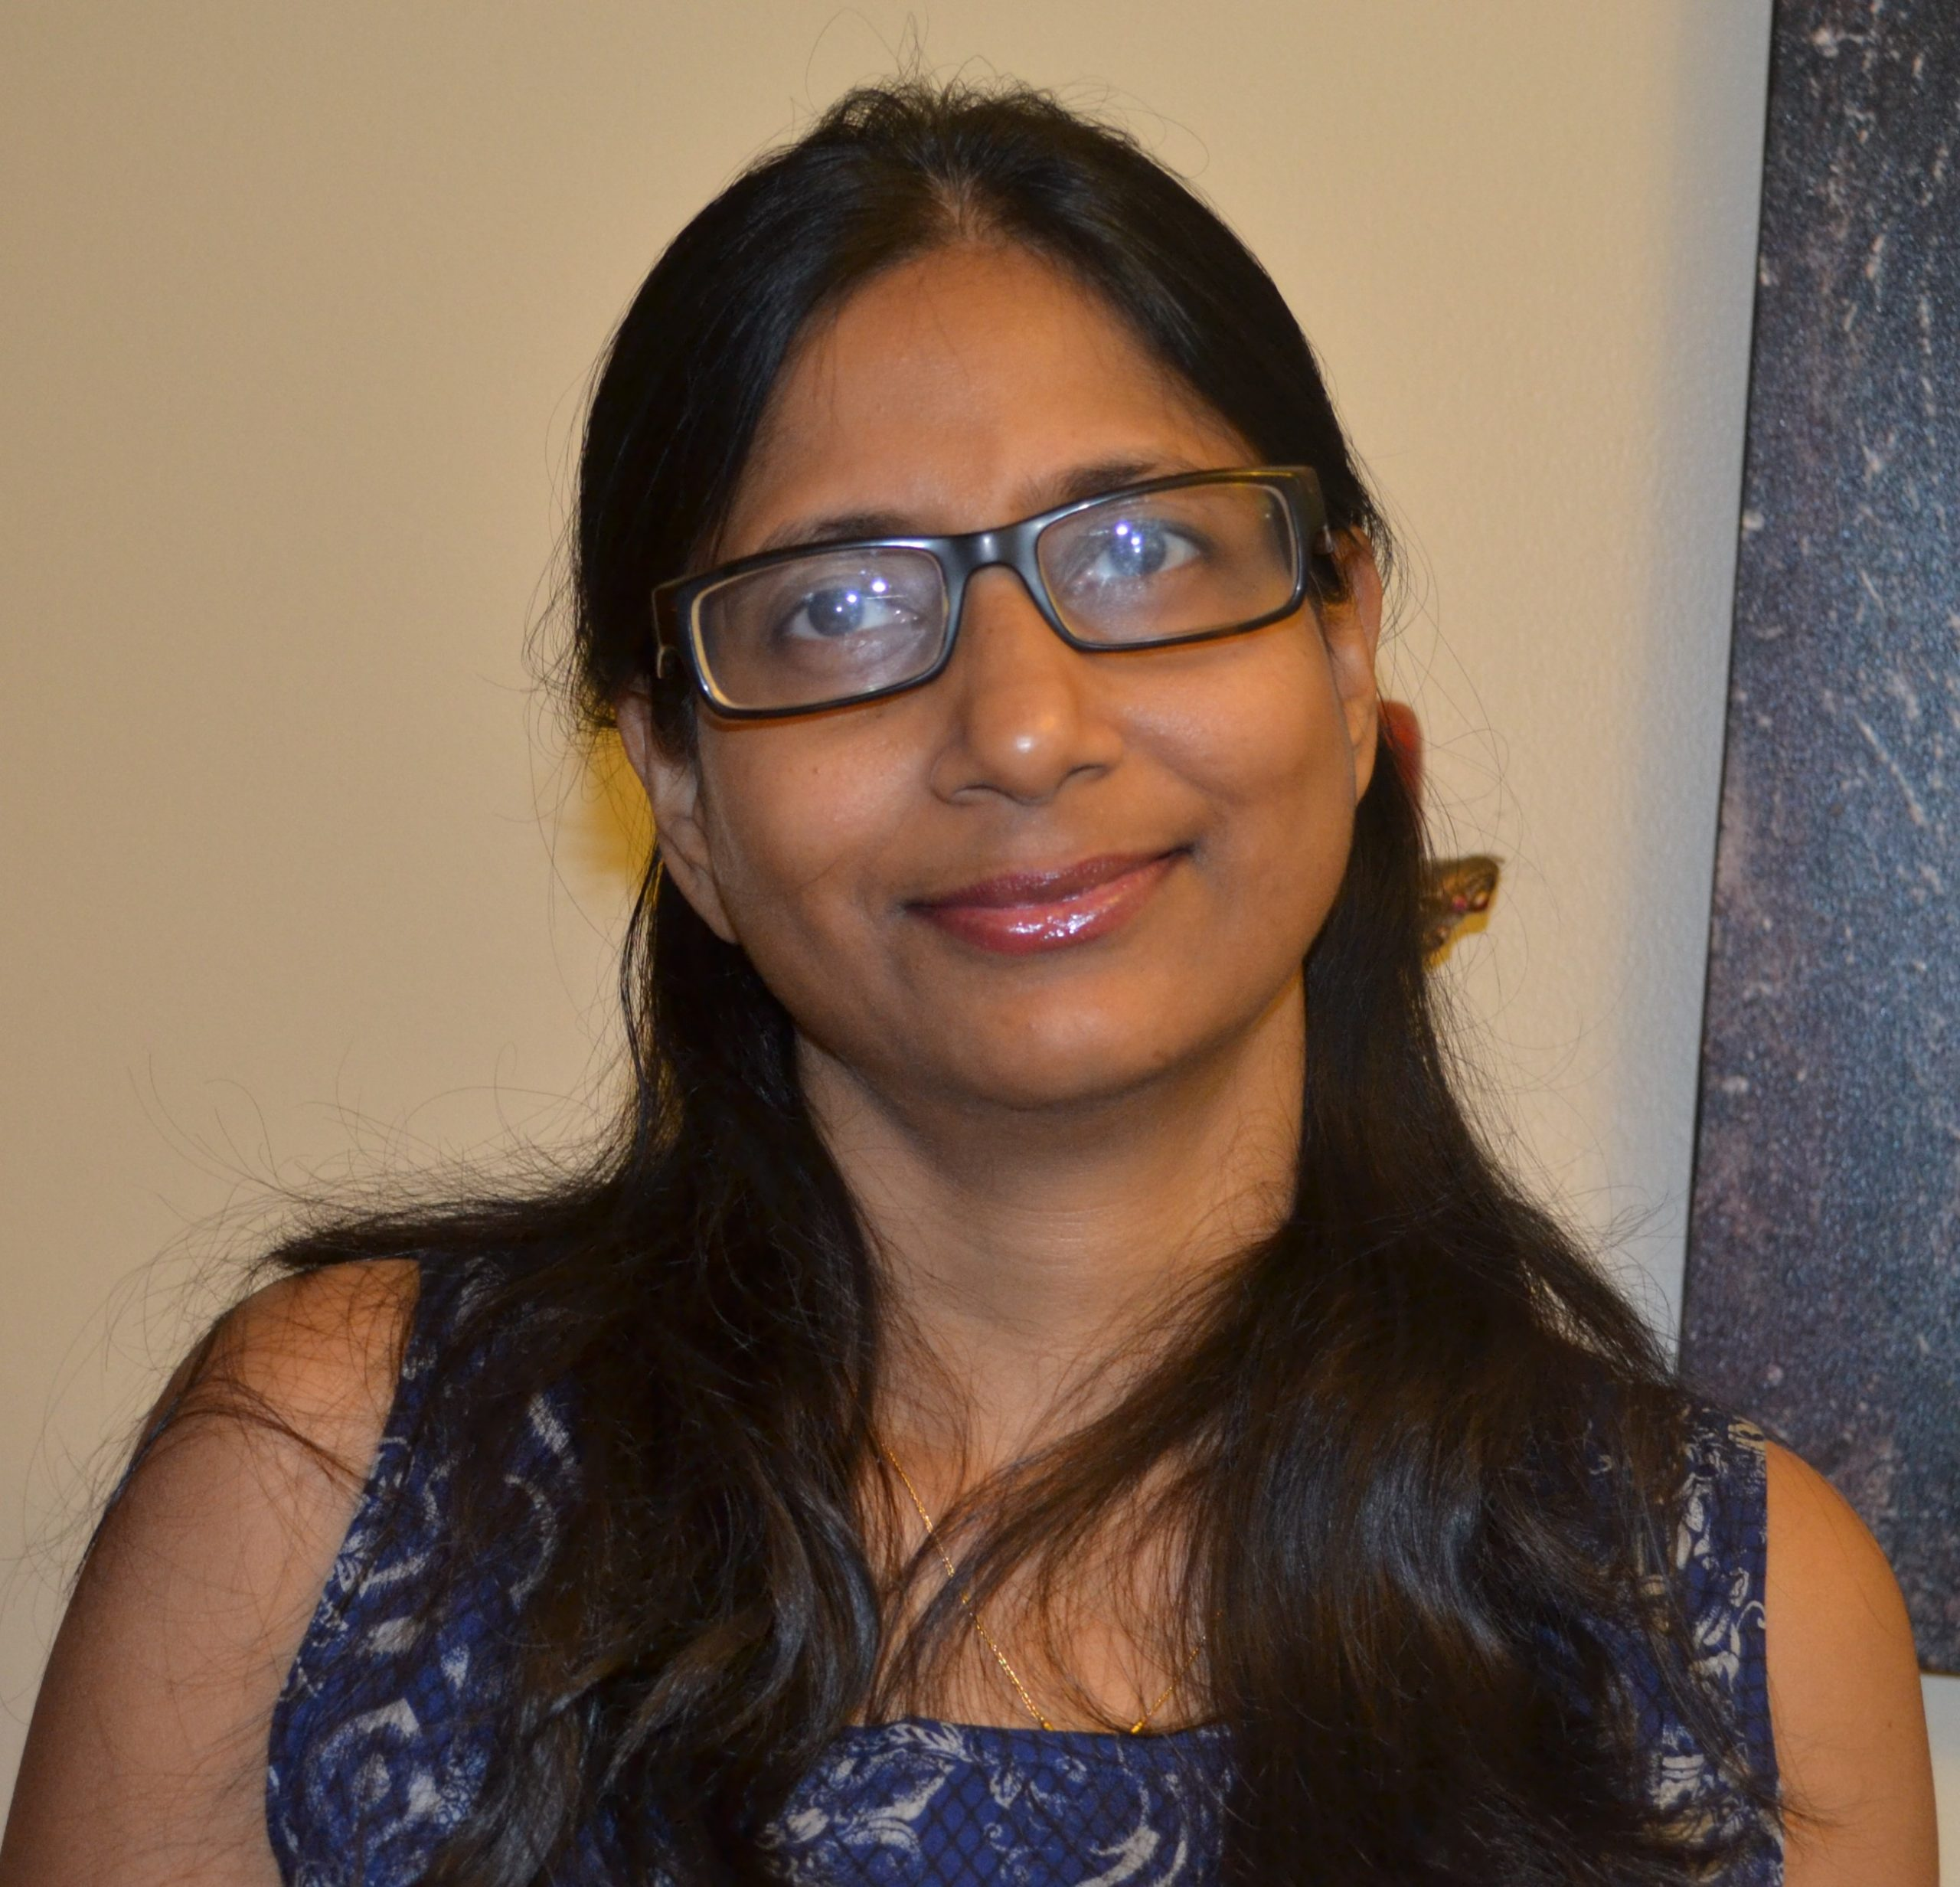 Binita Anand